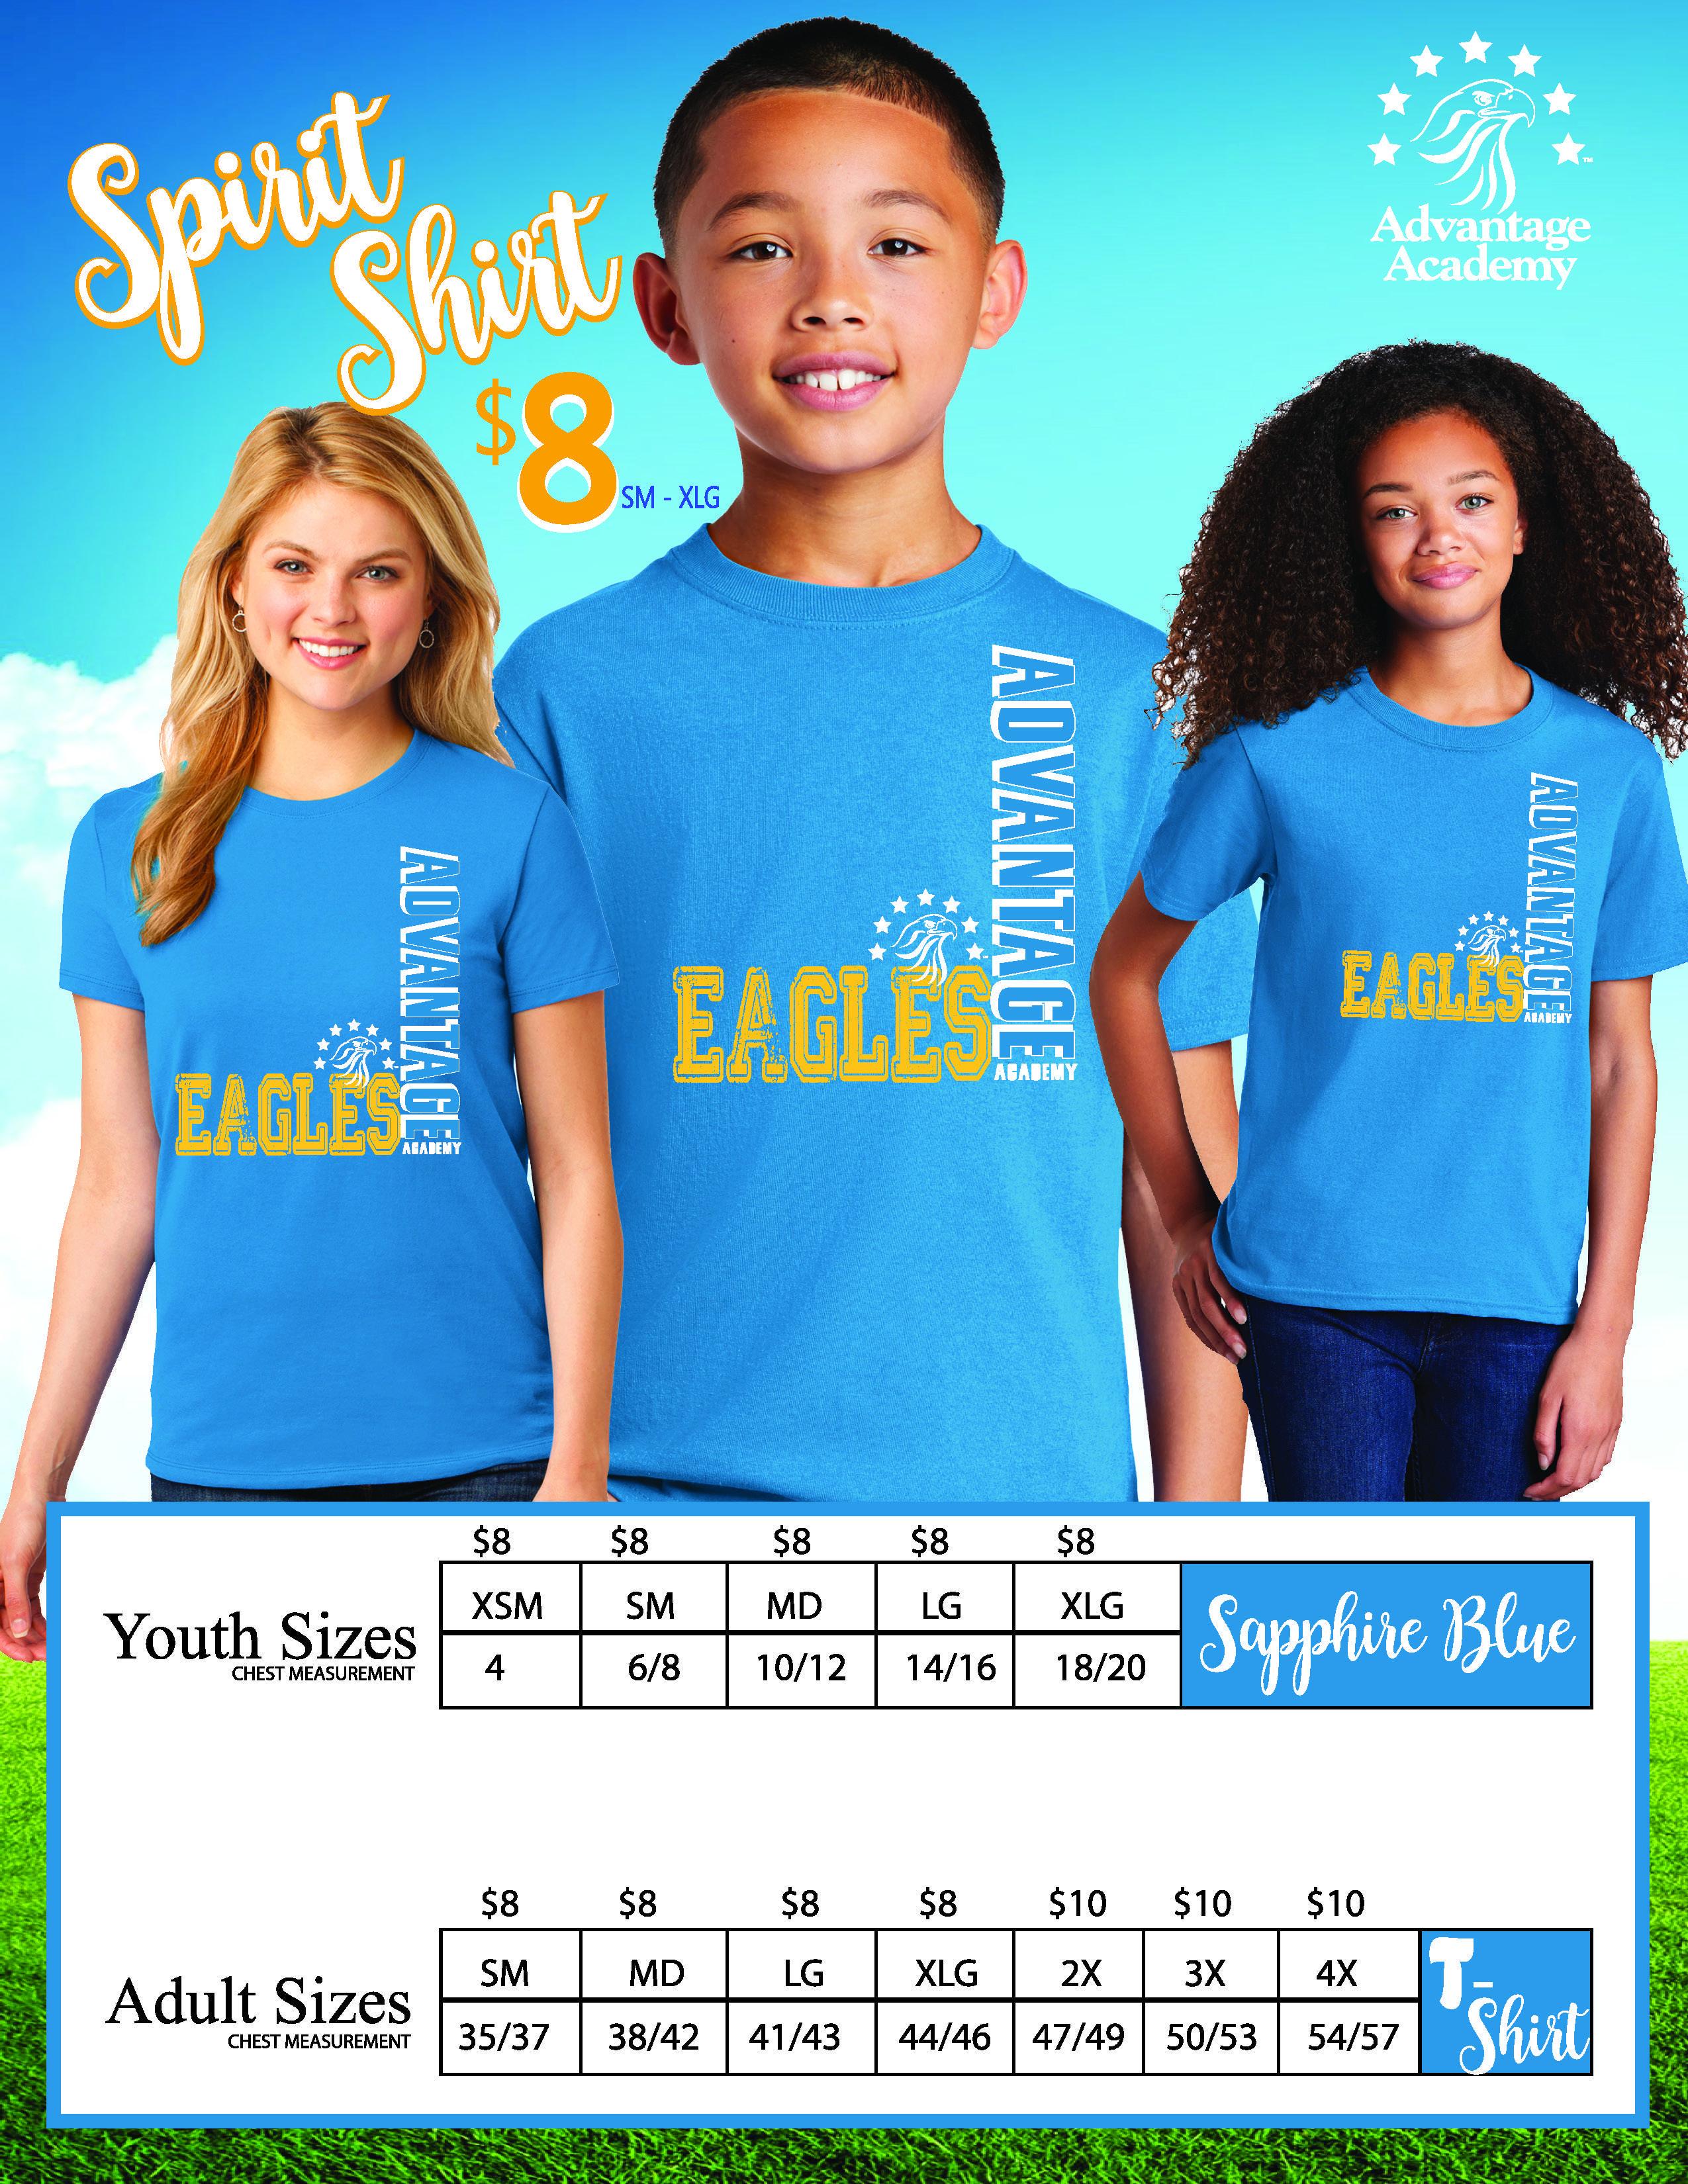 Advantage Academy Friday Spirit Shirts